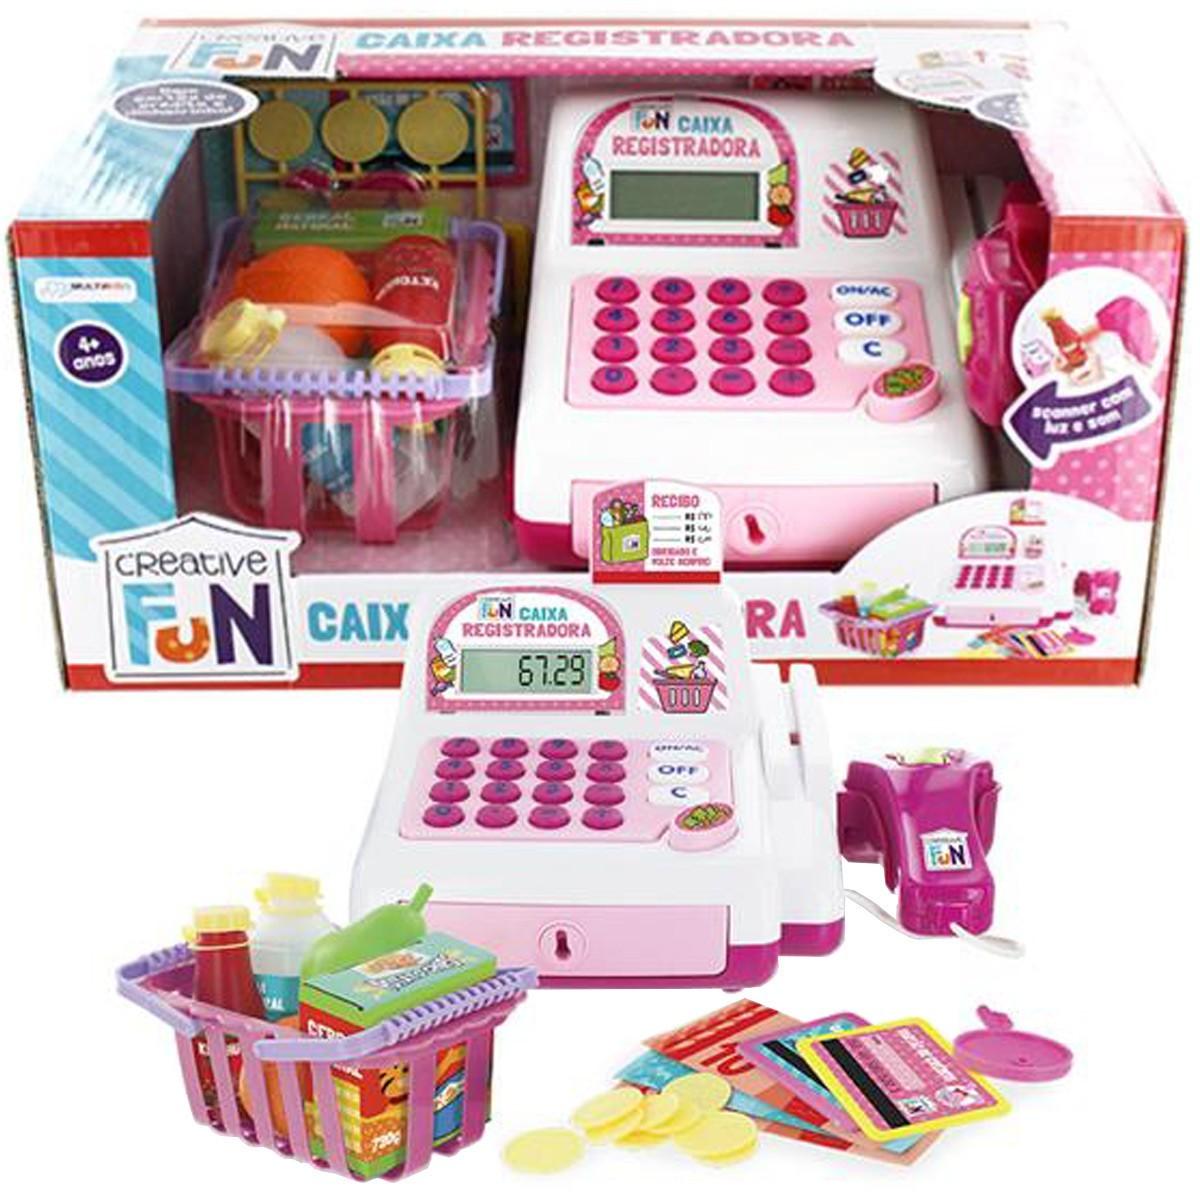 Creative Fun Caixa Registradora Rosa Multikids BR387